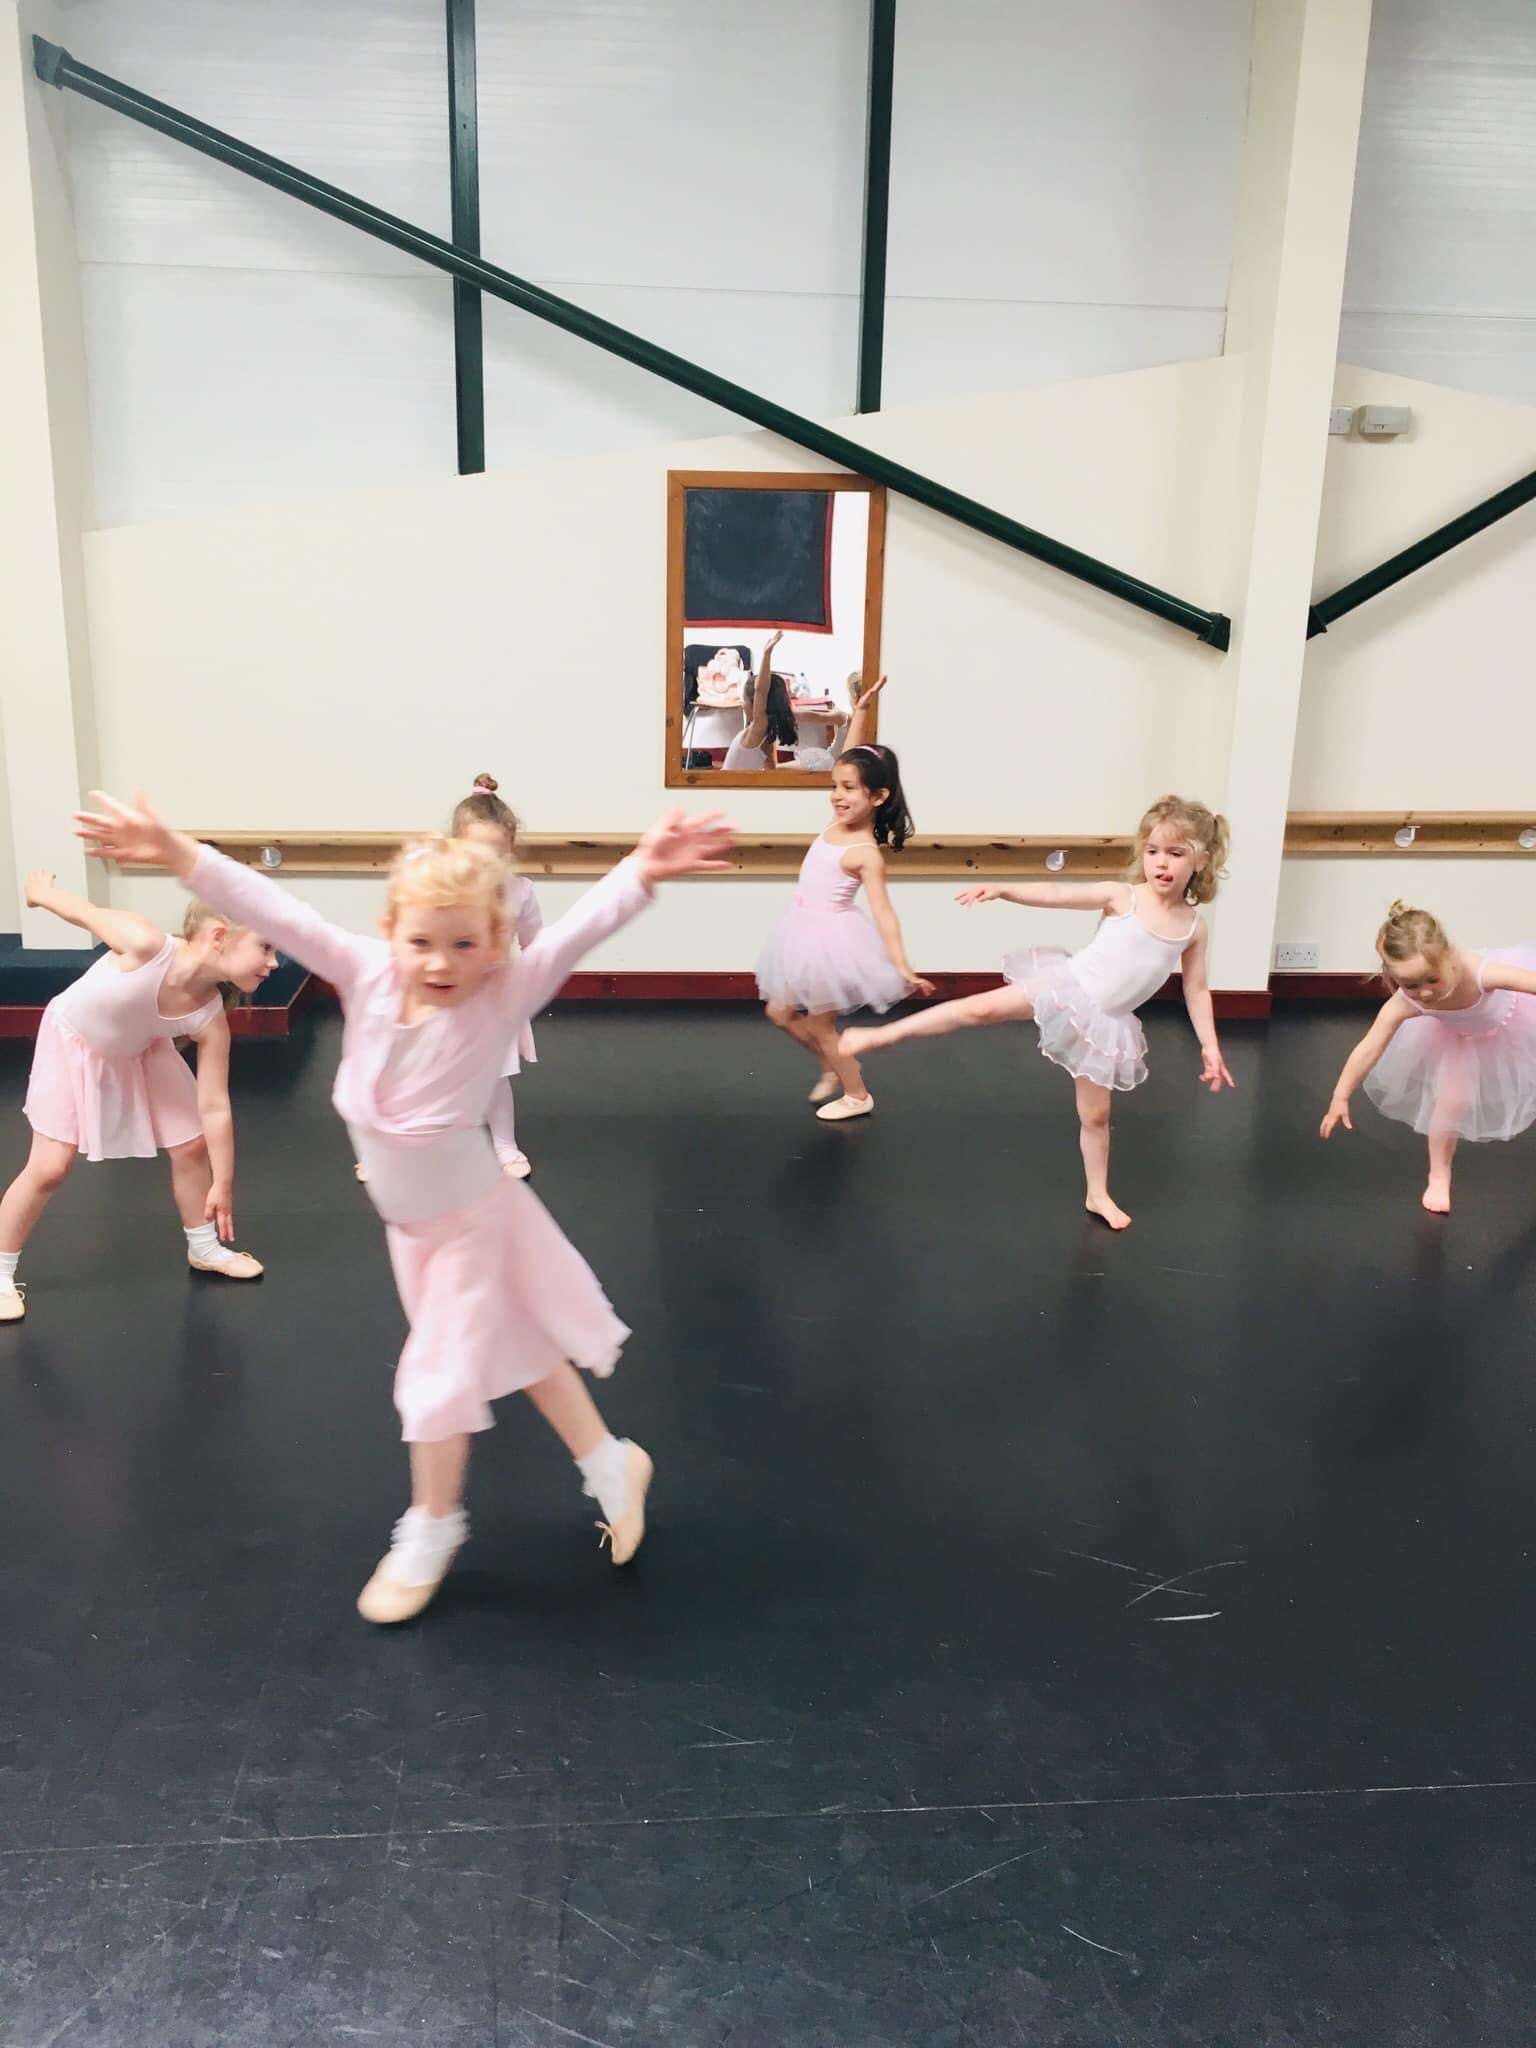 ballet class dancing